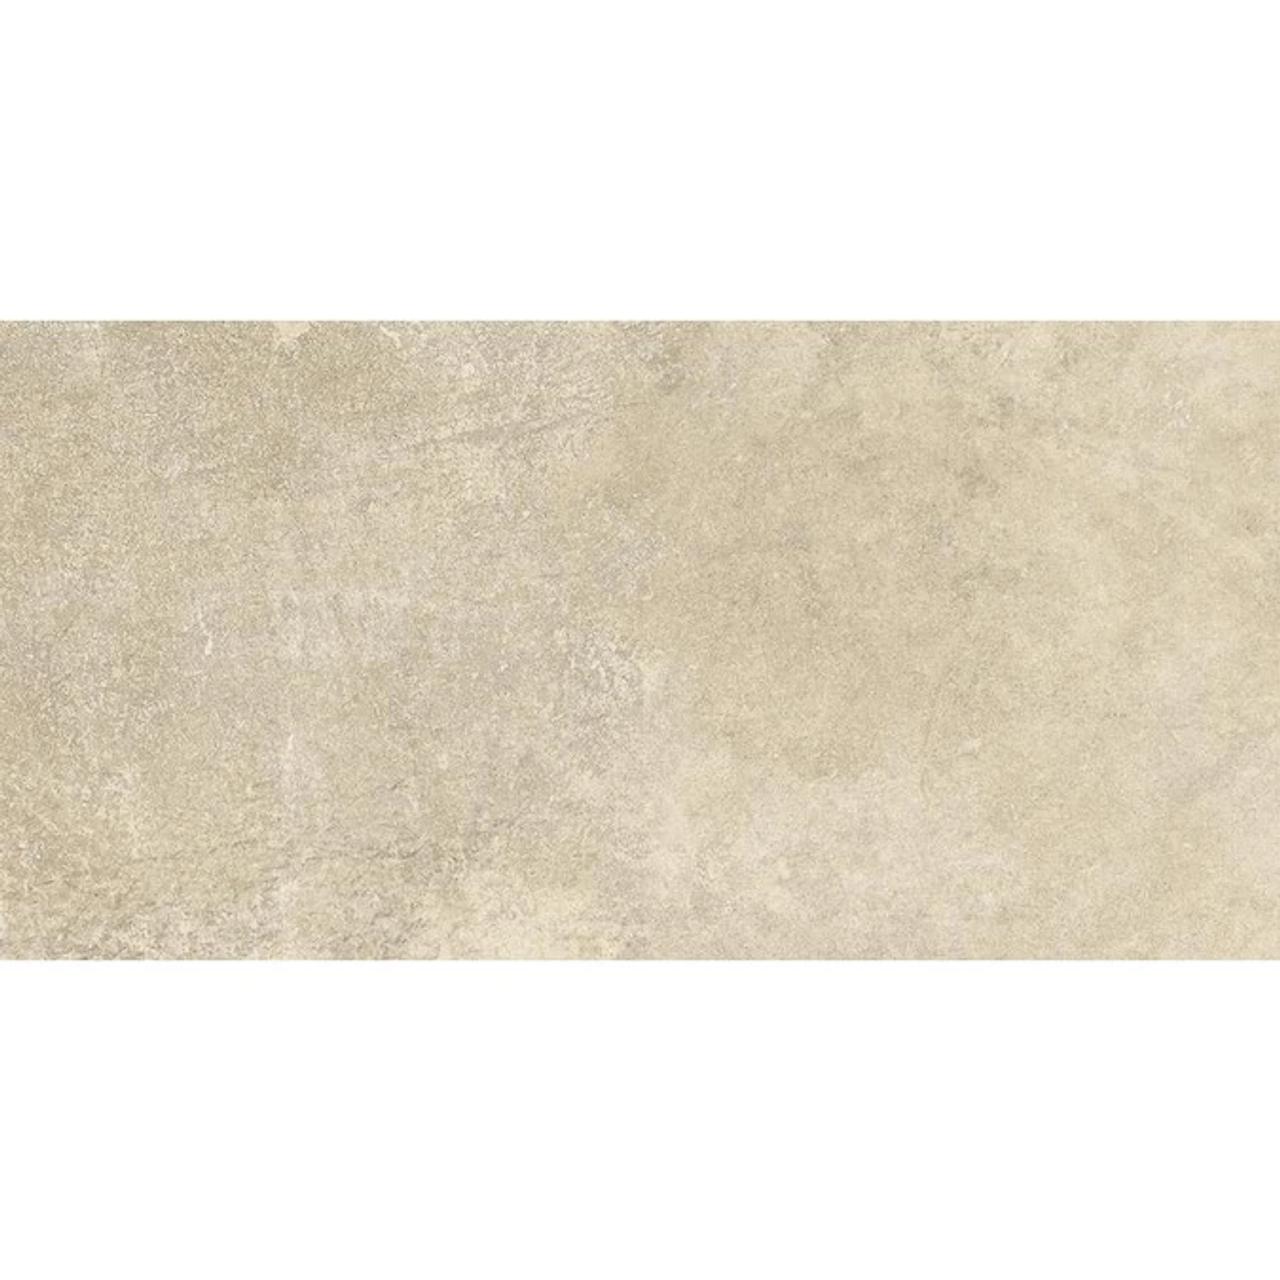 Sawyer Ivory 12x24   Porcelain Tile   1st Quality [15.54 SF / Box]